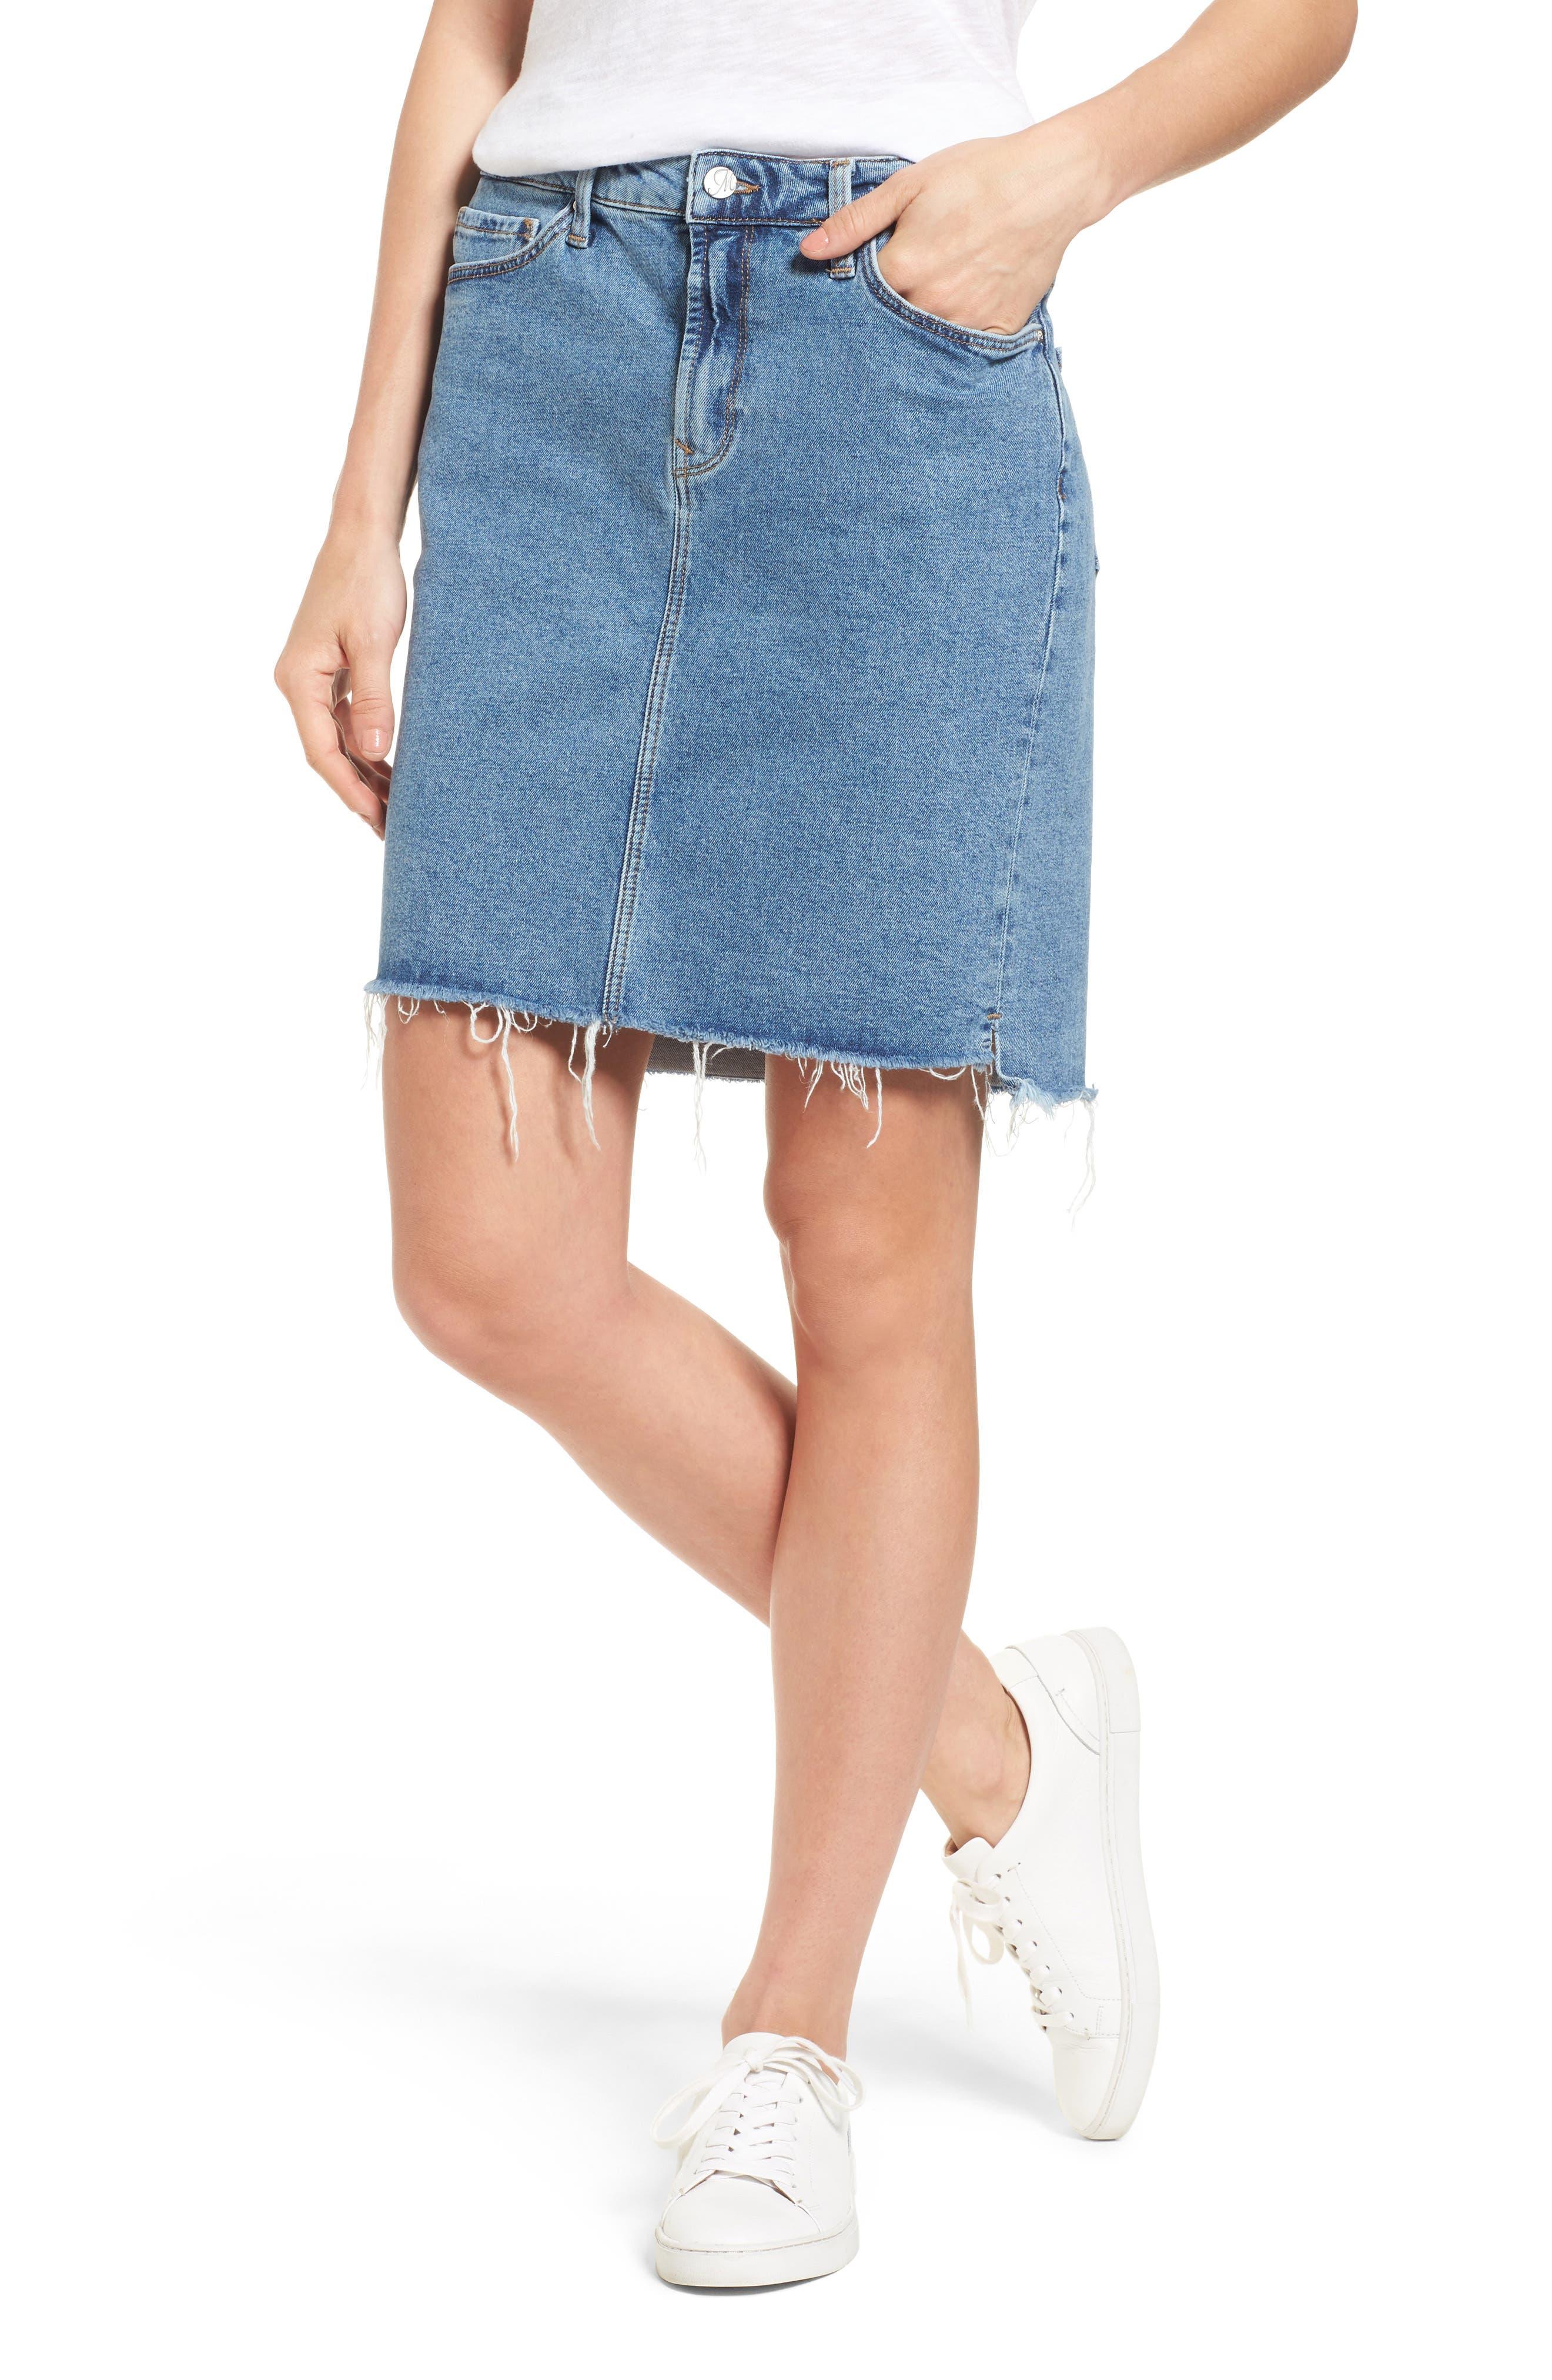 Mavi Jeans Mila Denim Skirt (Used Retro)